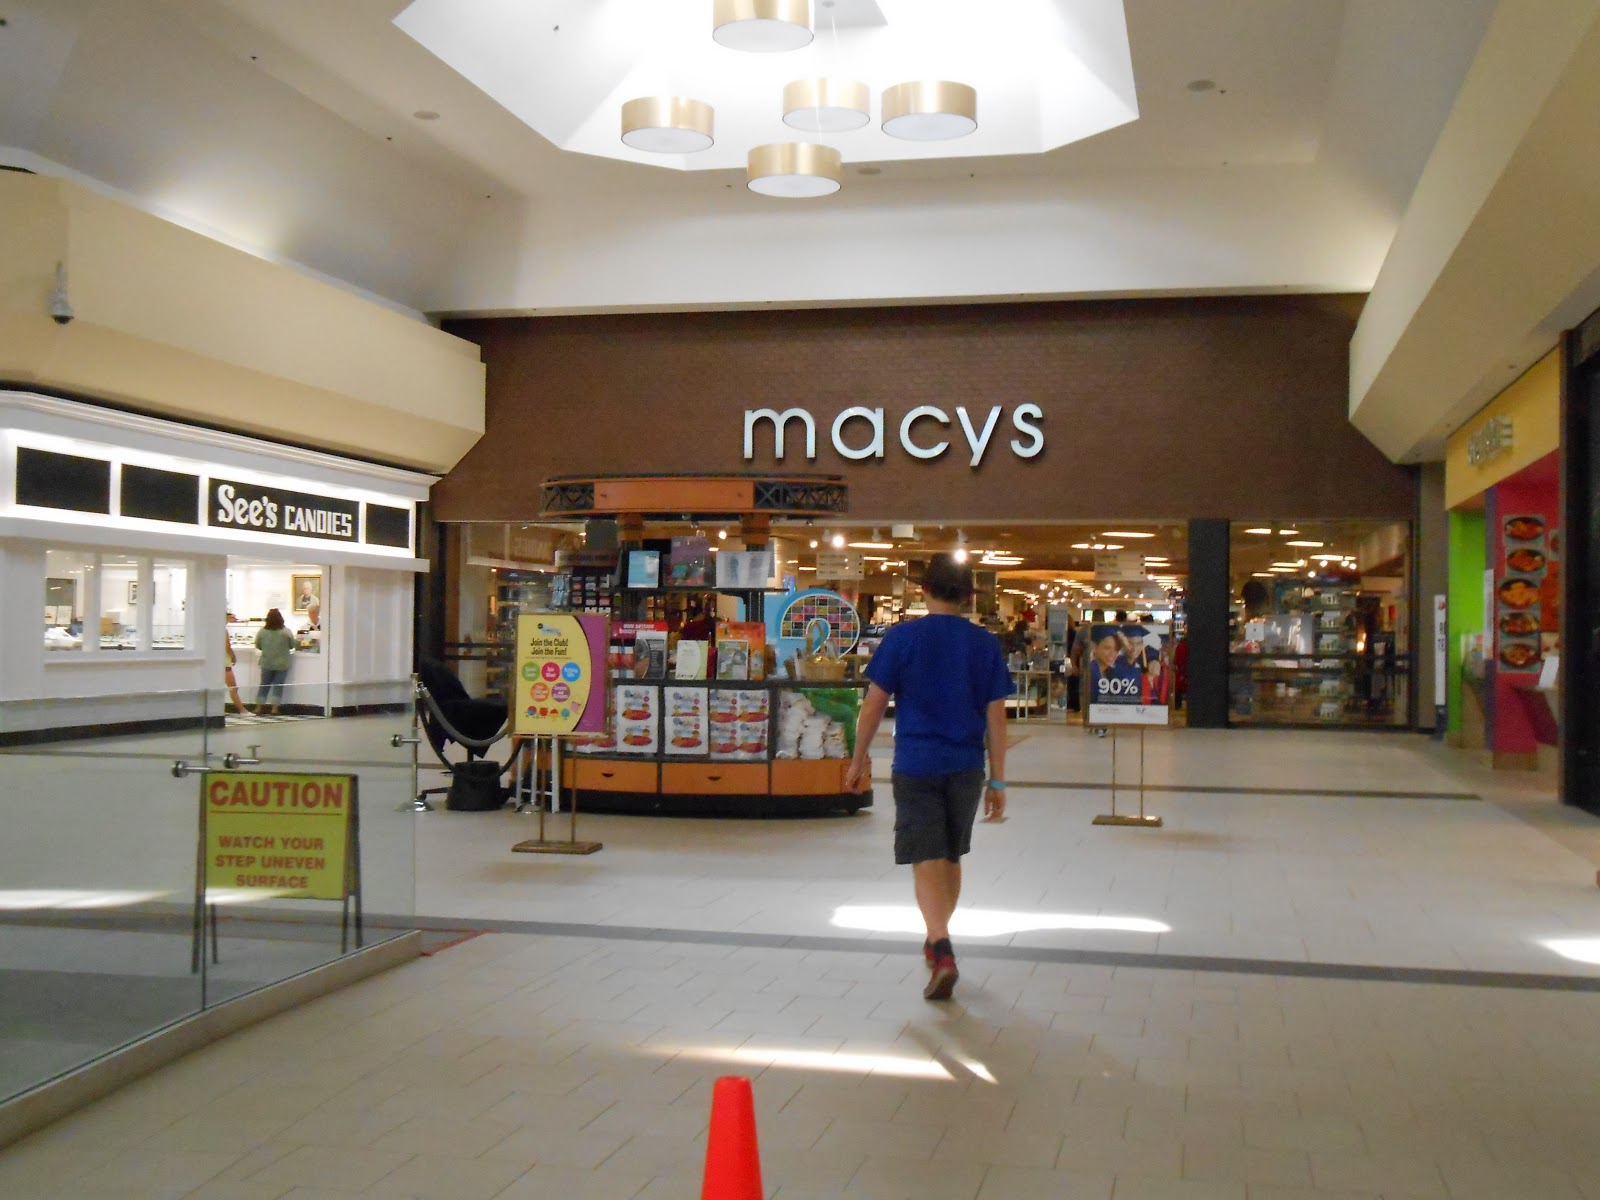 Hayden S Business Blog Meadowood Mall In Reno Will Get